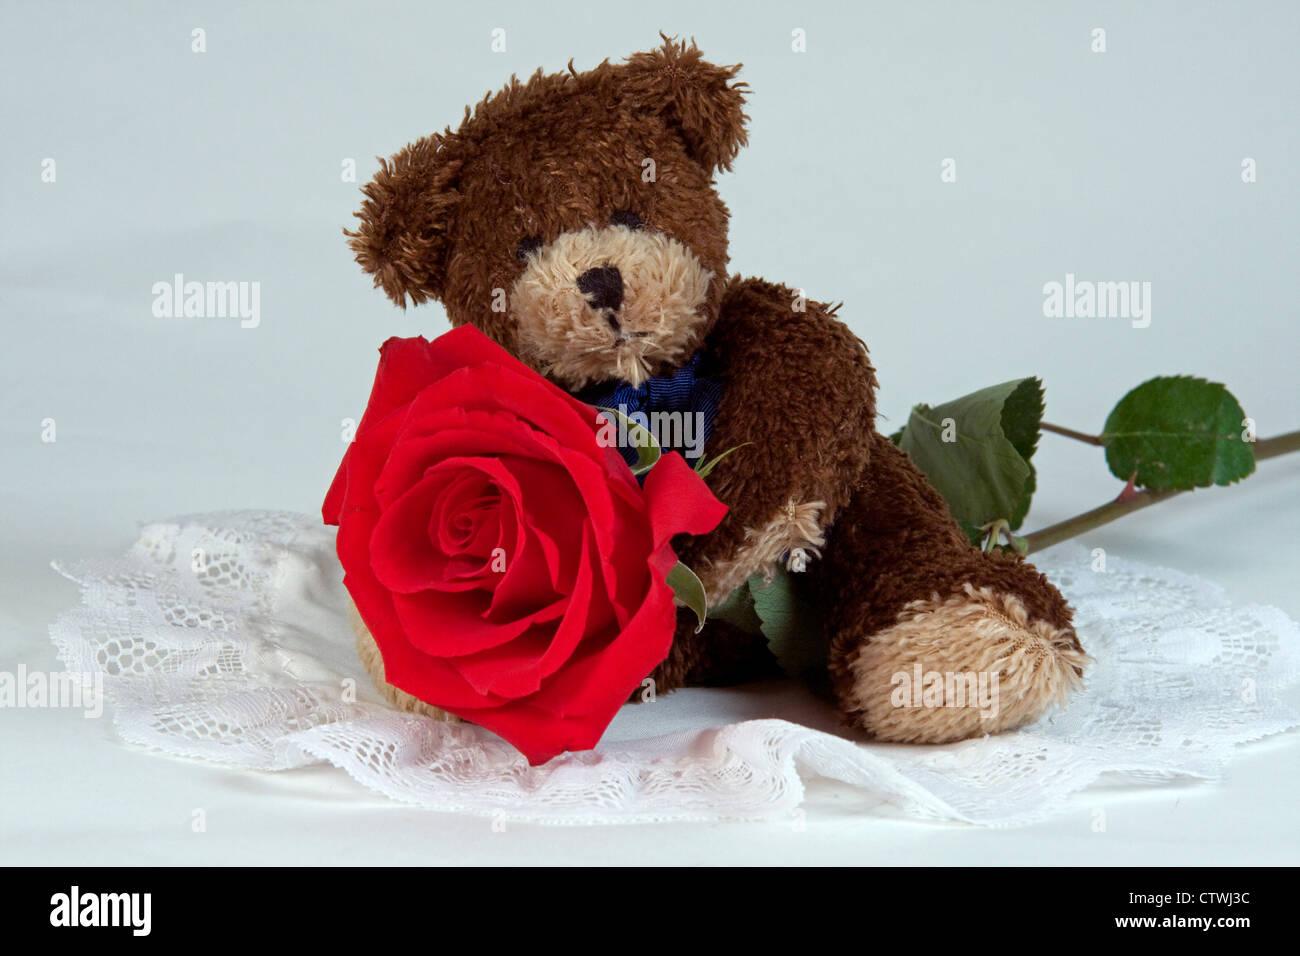 Teddy bear red rose stock photos teddy bear red rose stock images cute teddy bear on beautiful red rose stock image izmirmasajfo